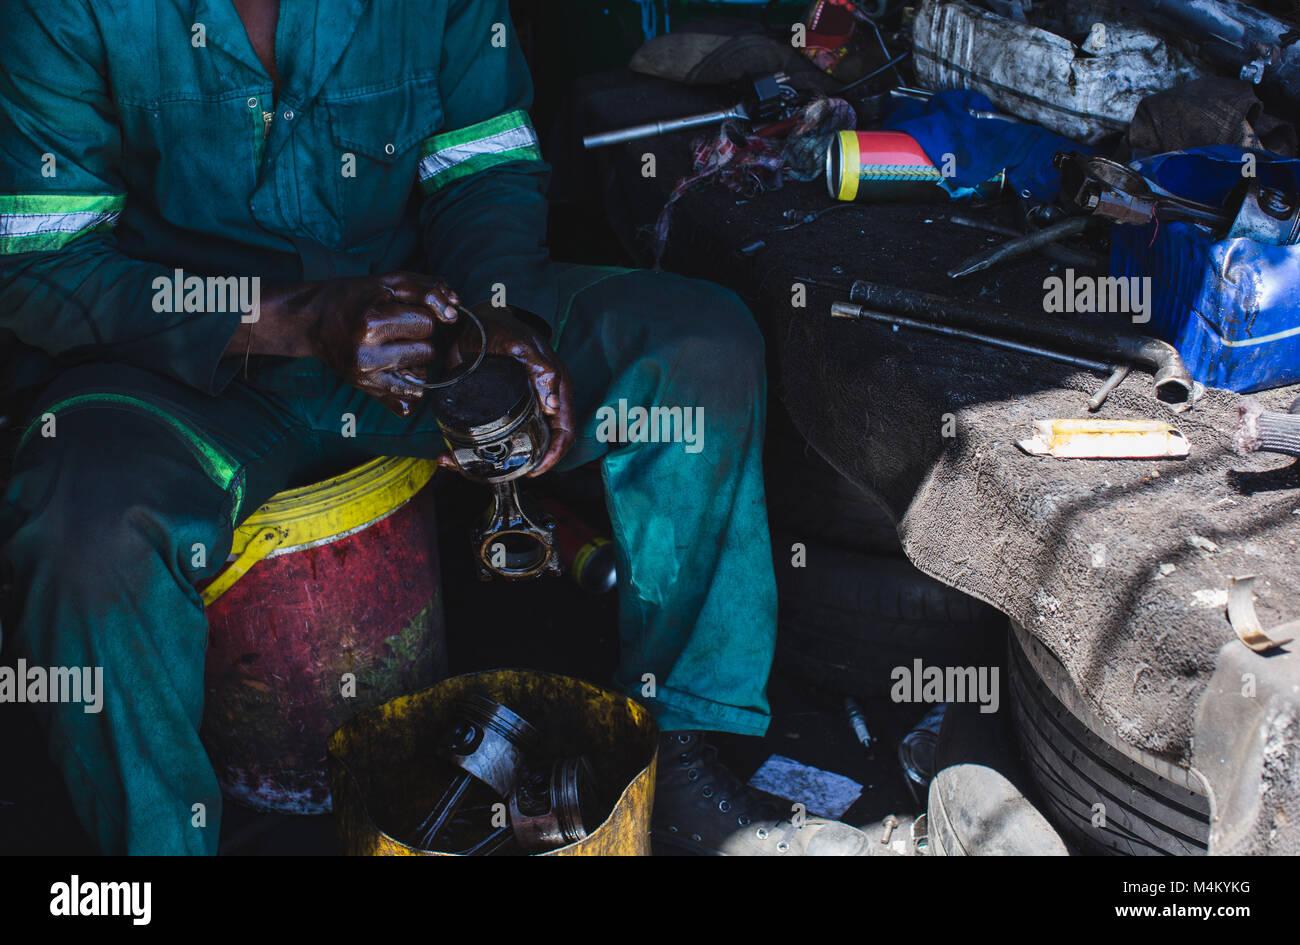 Mechanic repairing auto parts - Stock Image